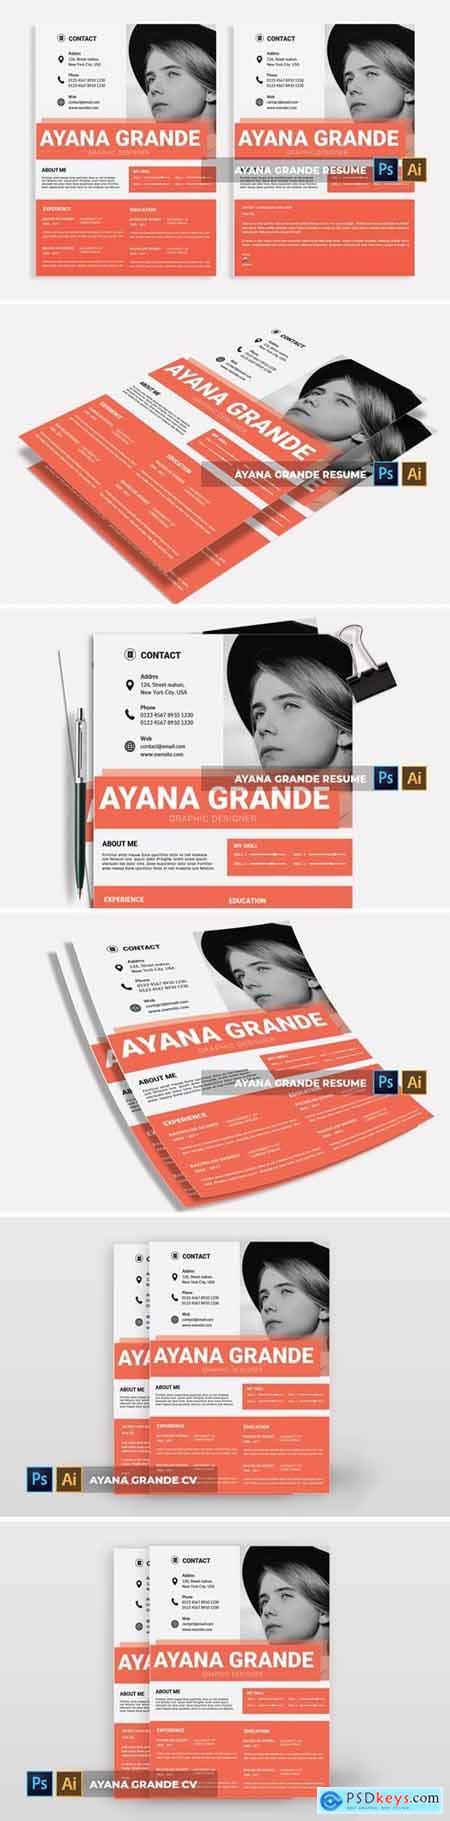 Ayana Grande - CV & Resume